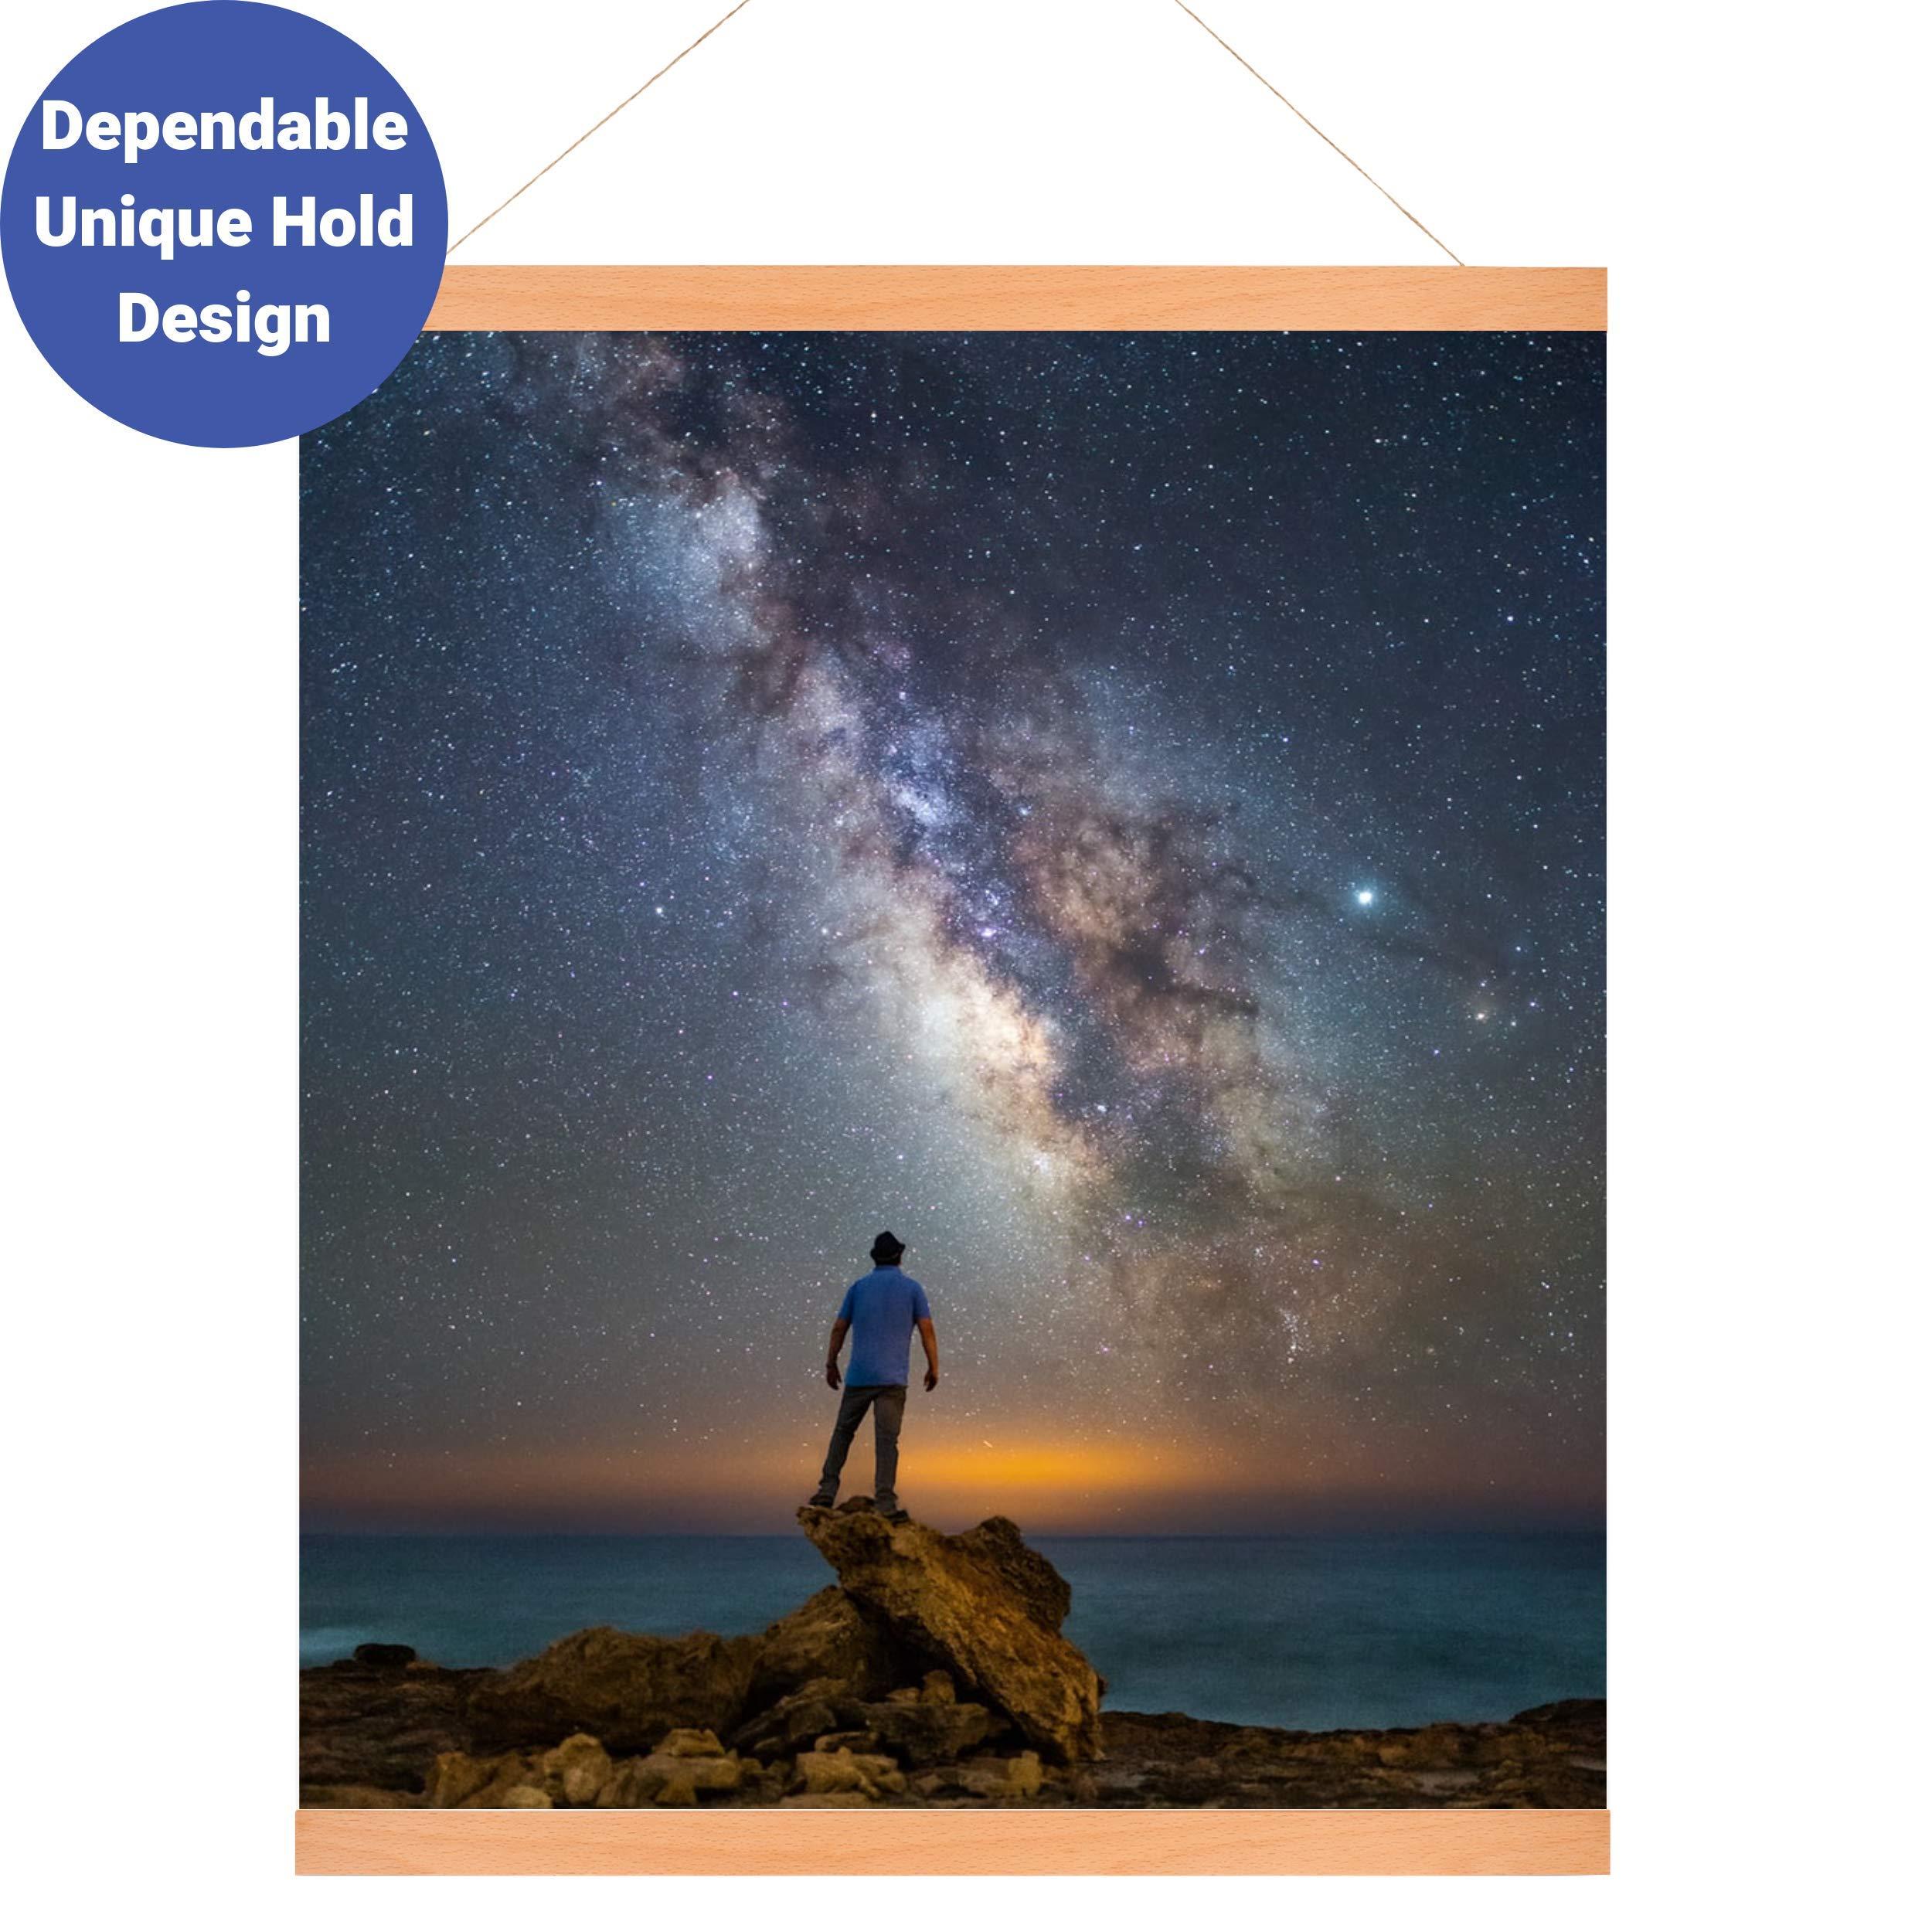 Swoodz Magnetic Poster Frame|Poster Frame for 24x36 18x24 24 x 26 Frame | Magnetic Poster Hanger| Heavy Duty Magnetic Frame by Swoodz